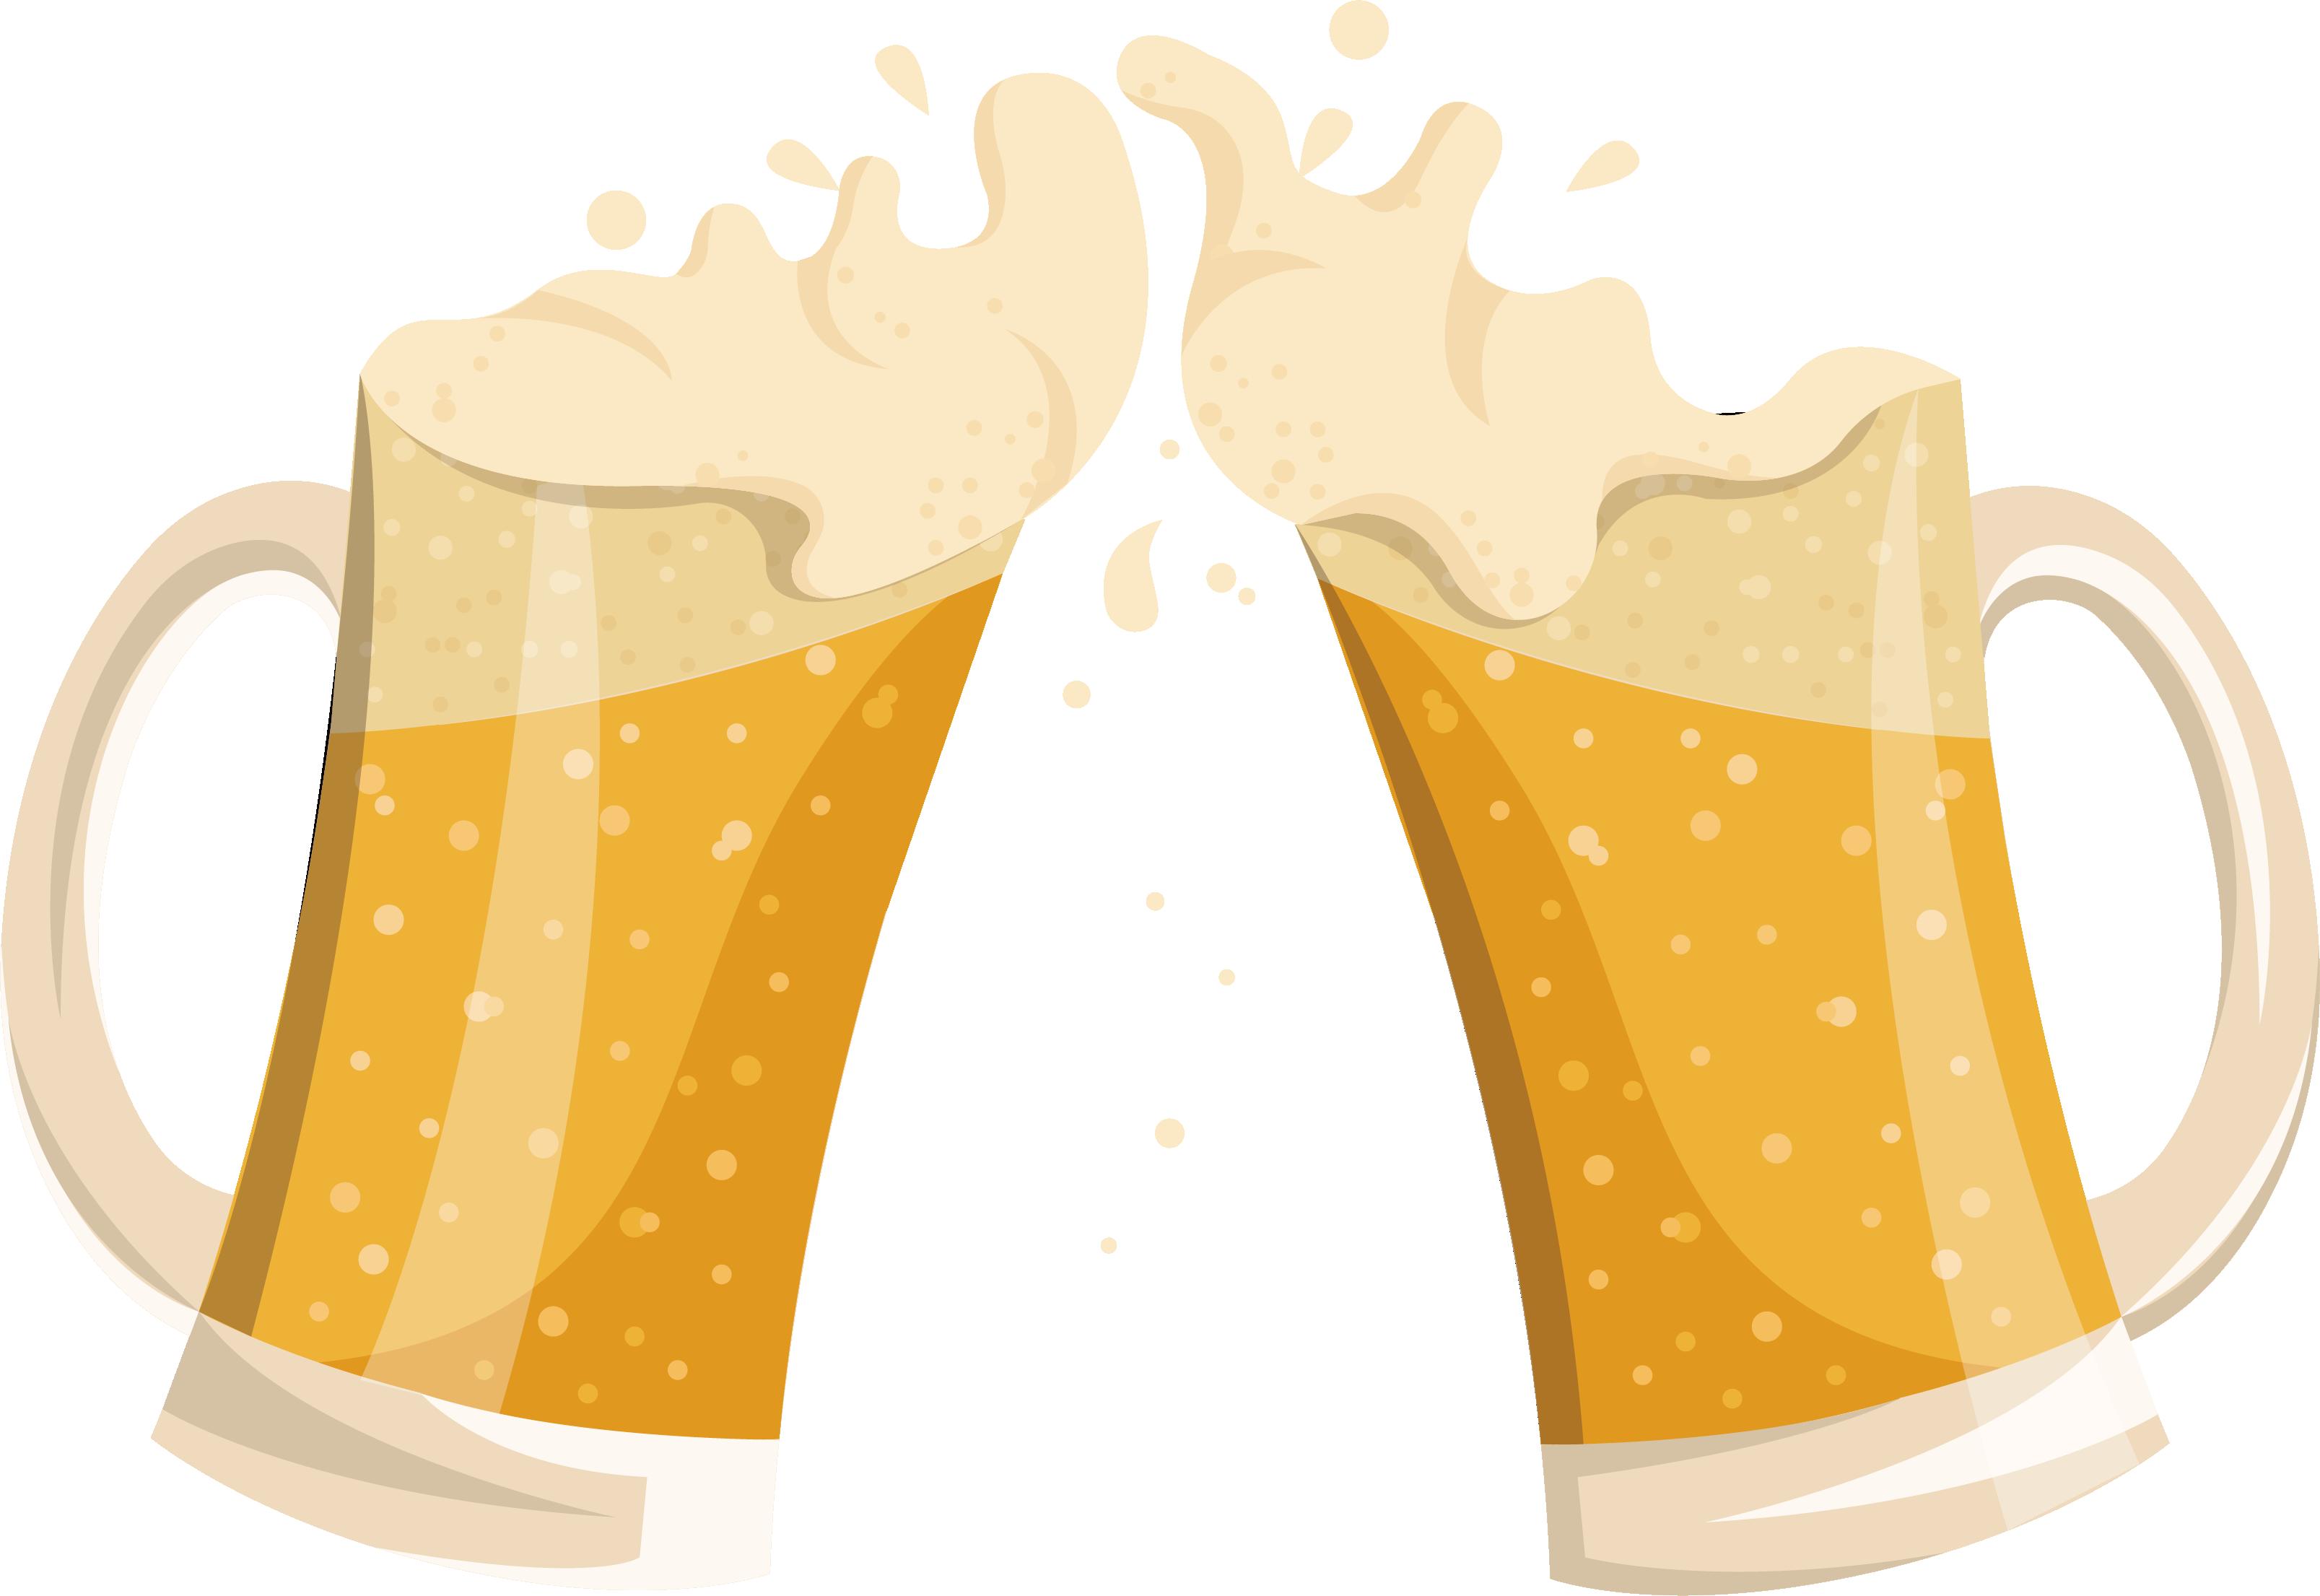 jpg transparent download Glassware mug cup glass. Cheers clipart beer food.